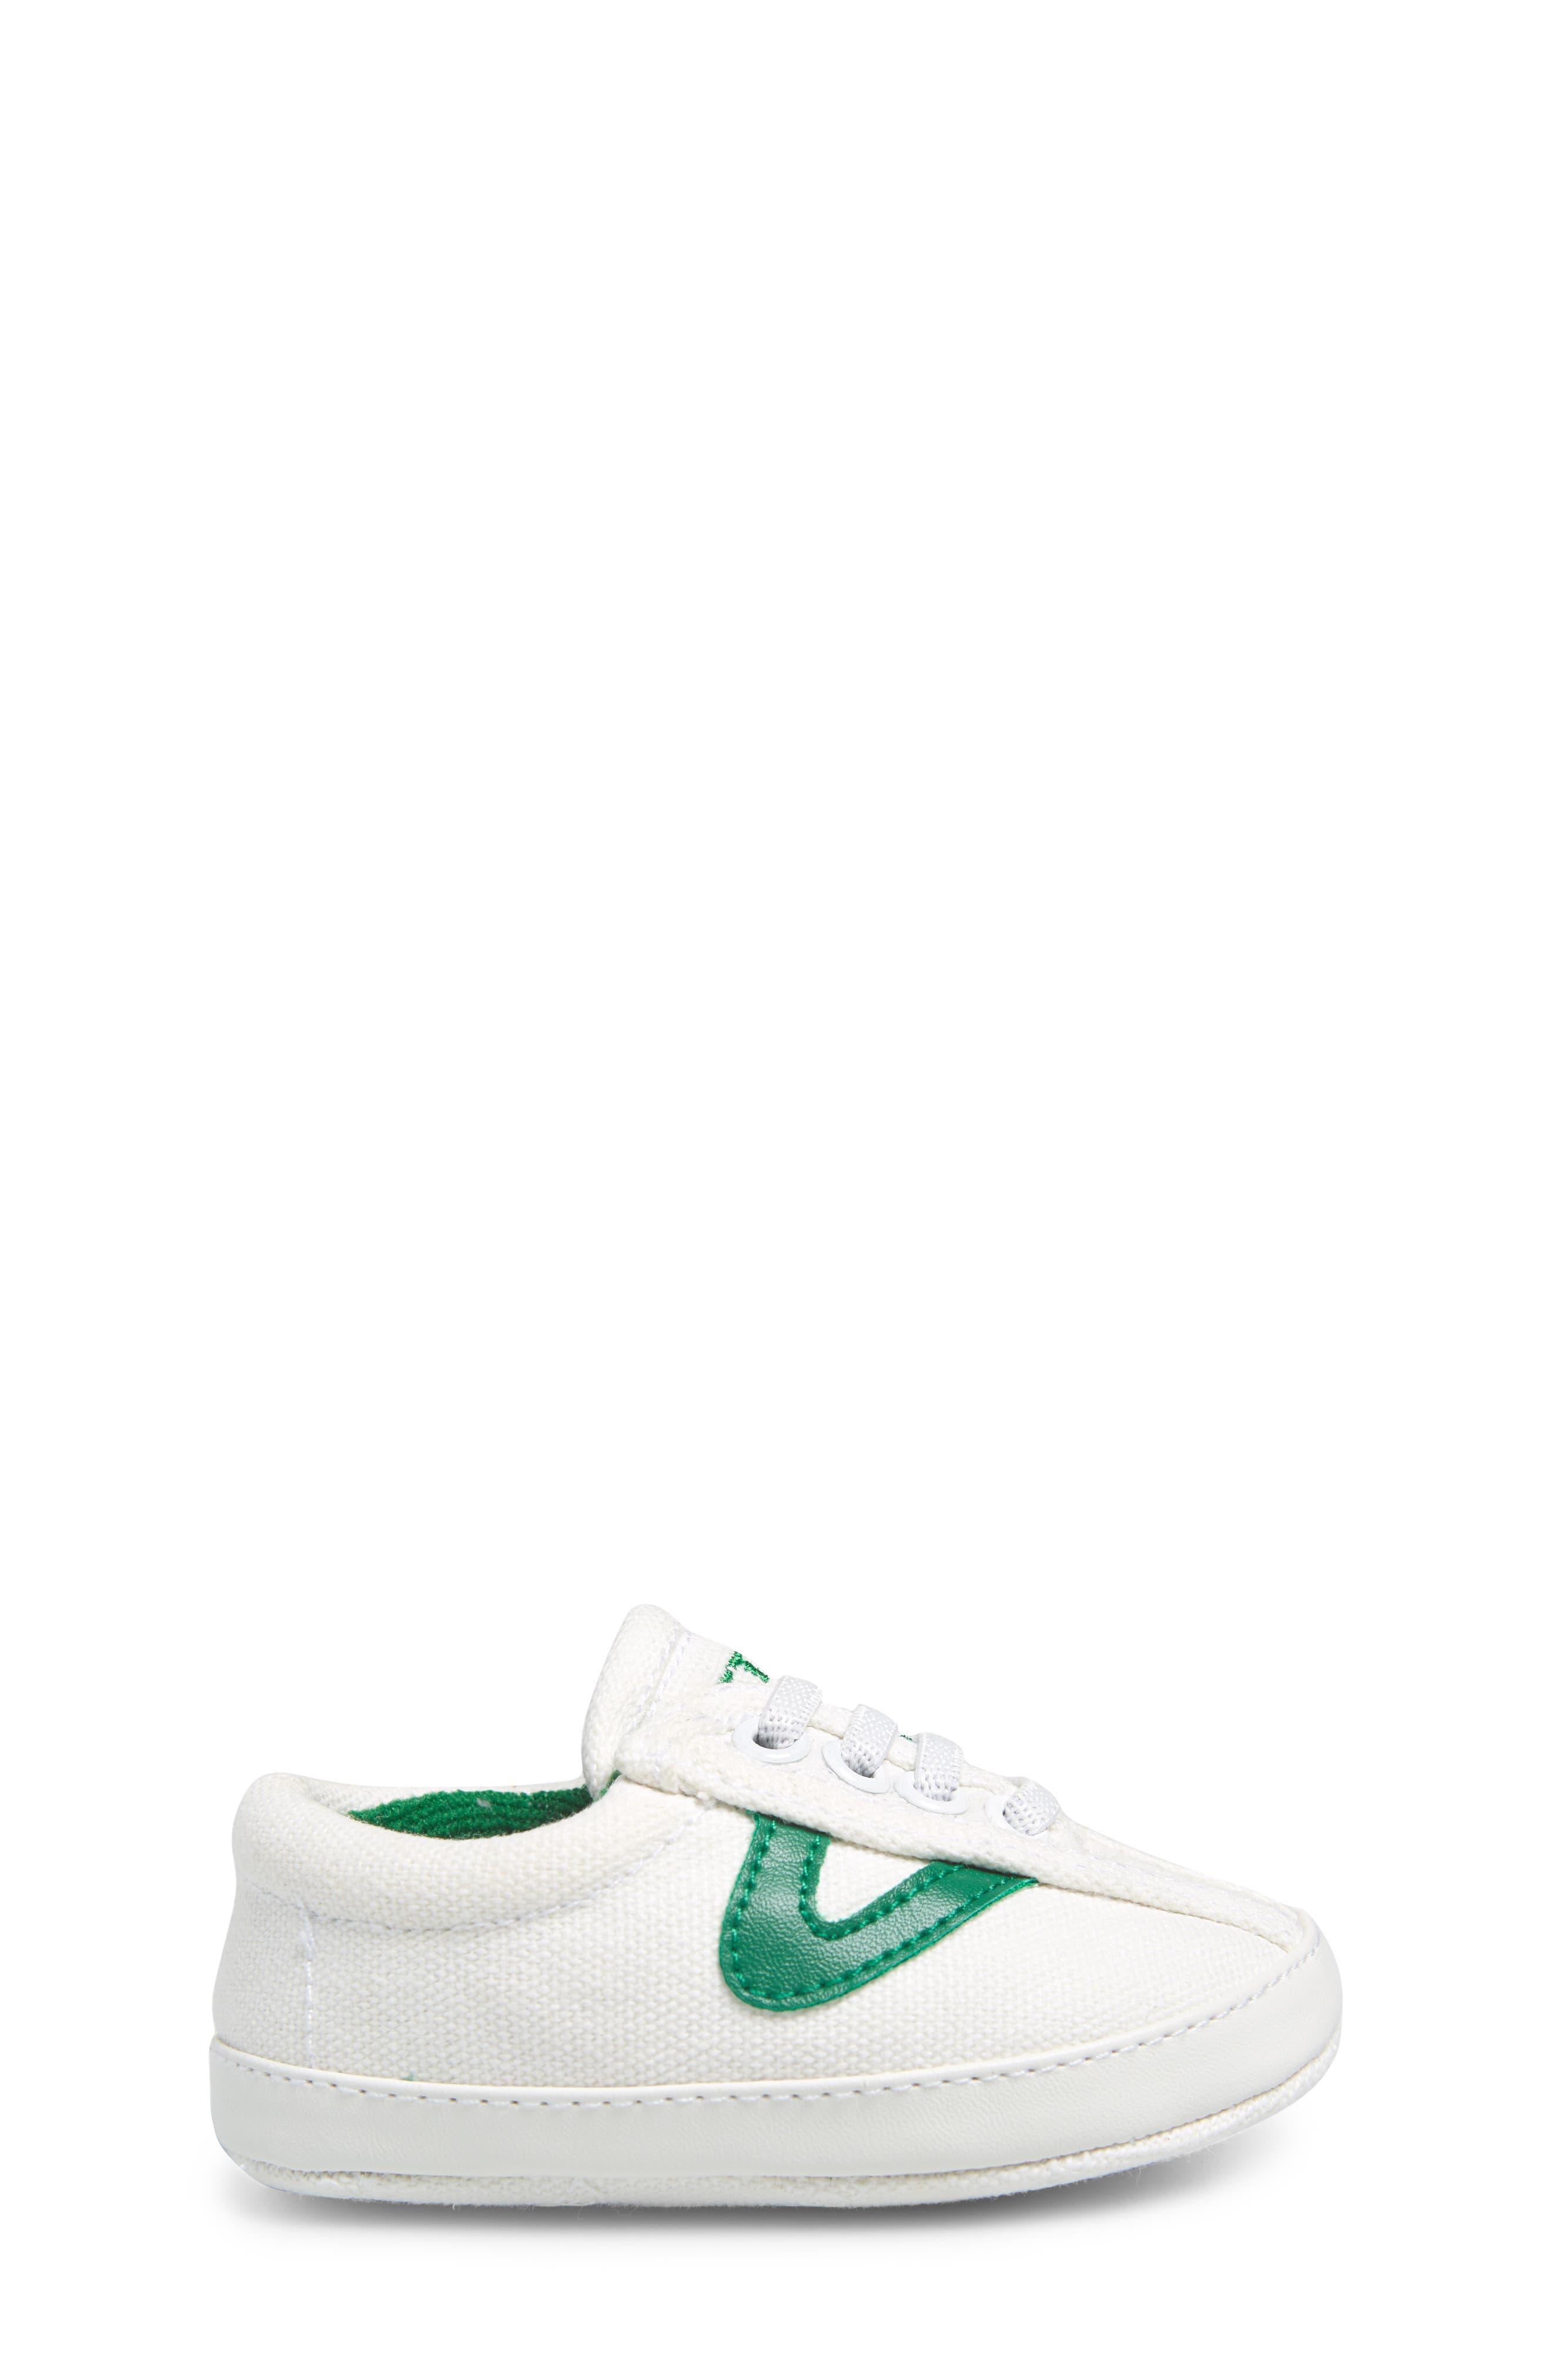 Nylite Plus Sneaker,                             Alternate thumbnail 3, color,                             WHITE/ GREEN